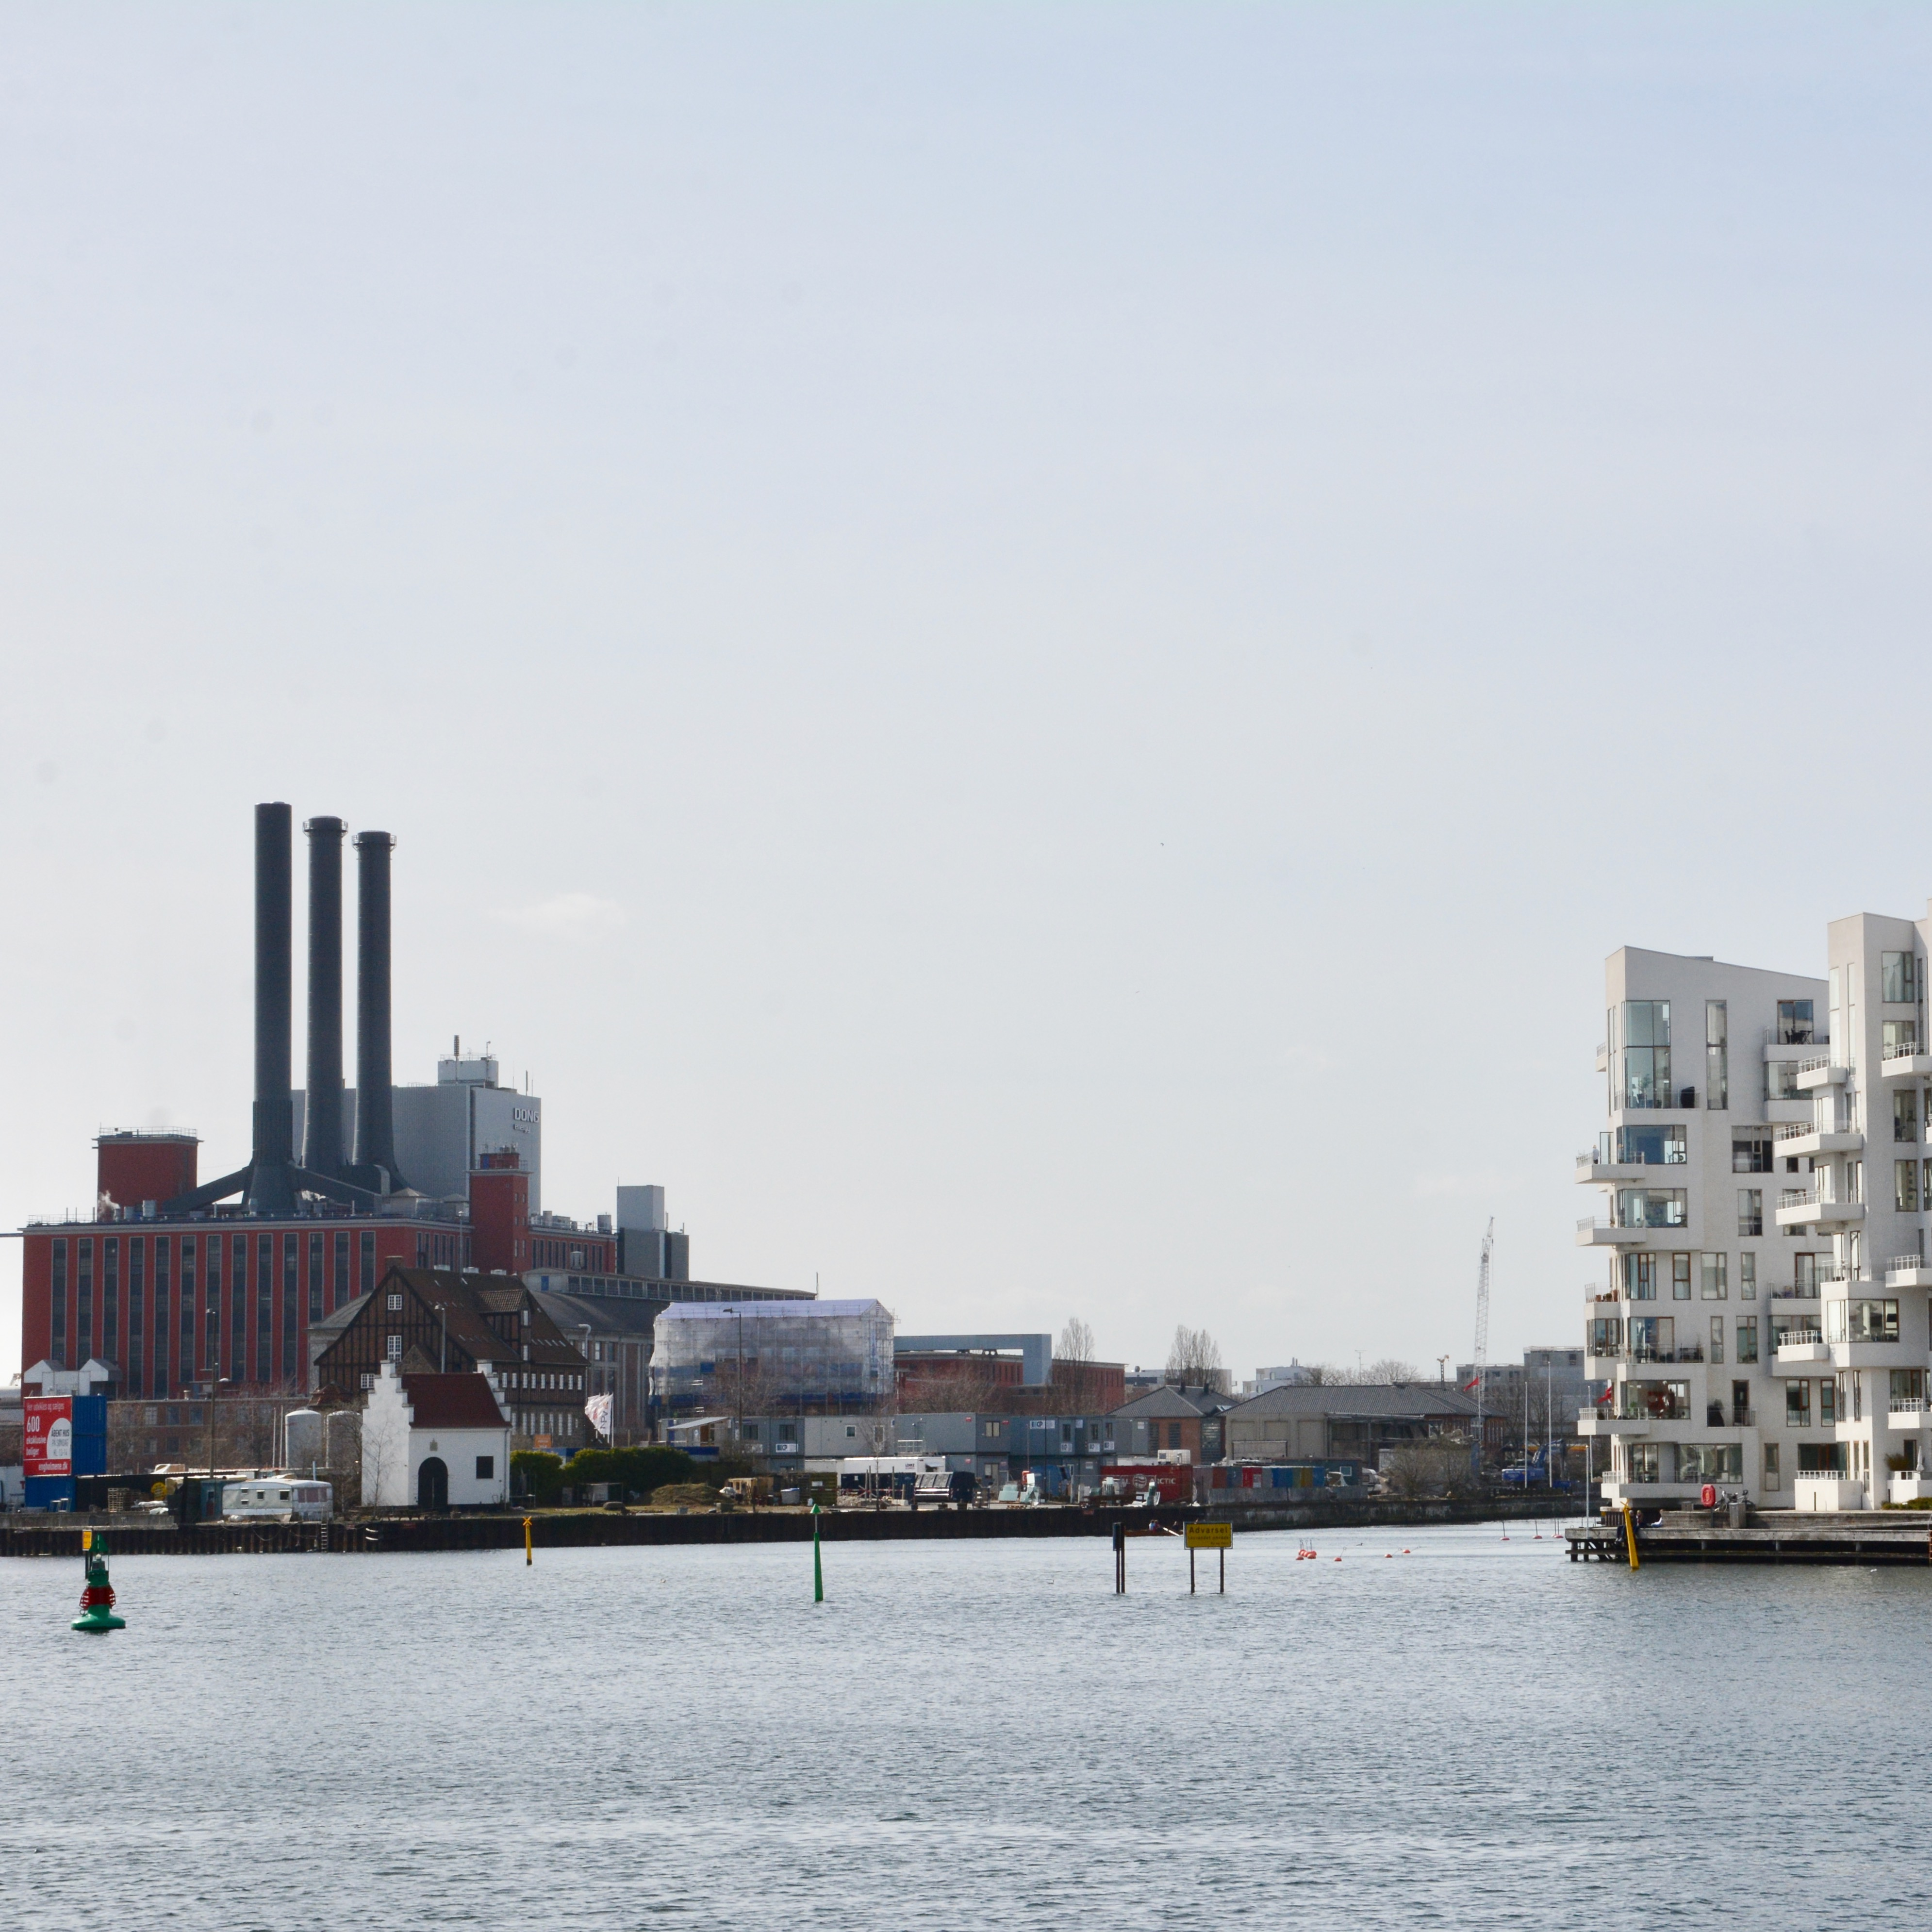 travel with kids children Copenhagen Denmark christianshavn harbour architecture